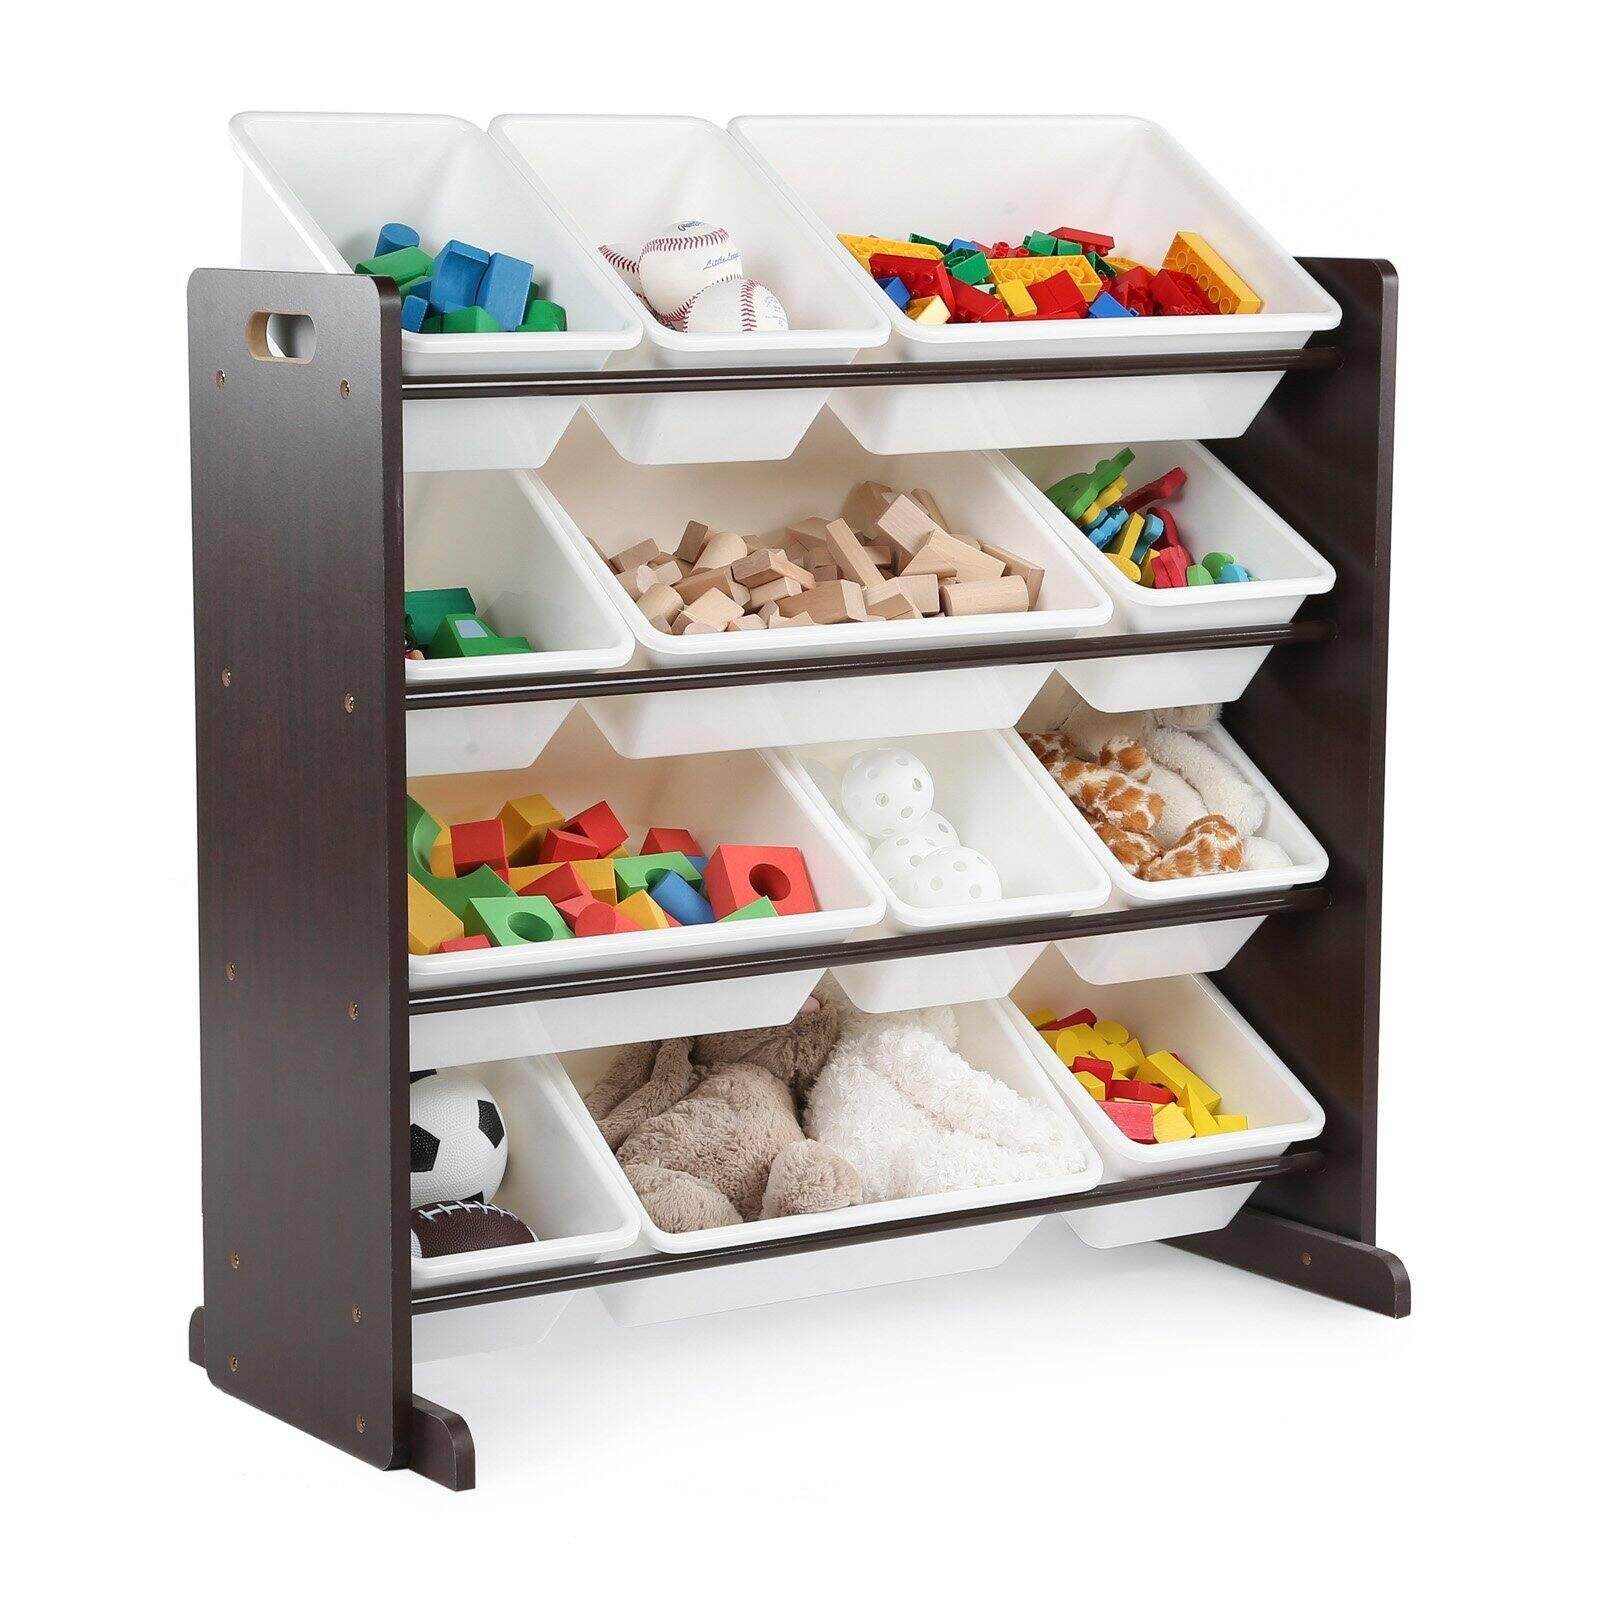 Tot Tutors Kids Toy Storage Organizer With 12 Bins Espresso In 2020 Toy Storage Organization Toy Organization Kid Toy Storage